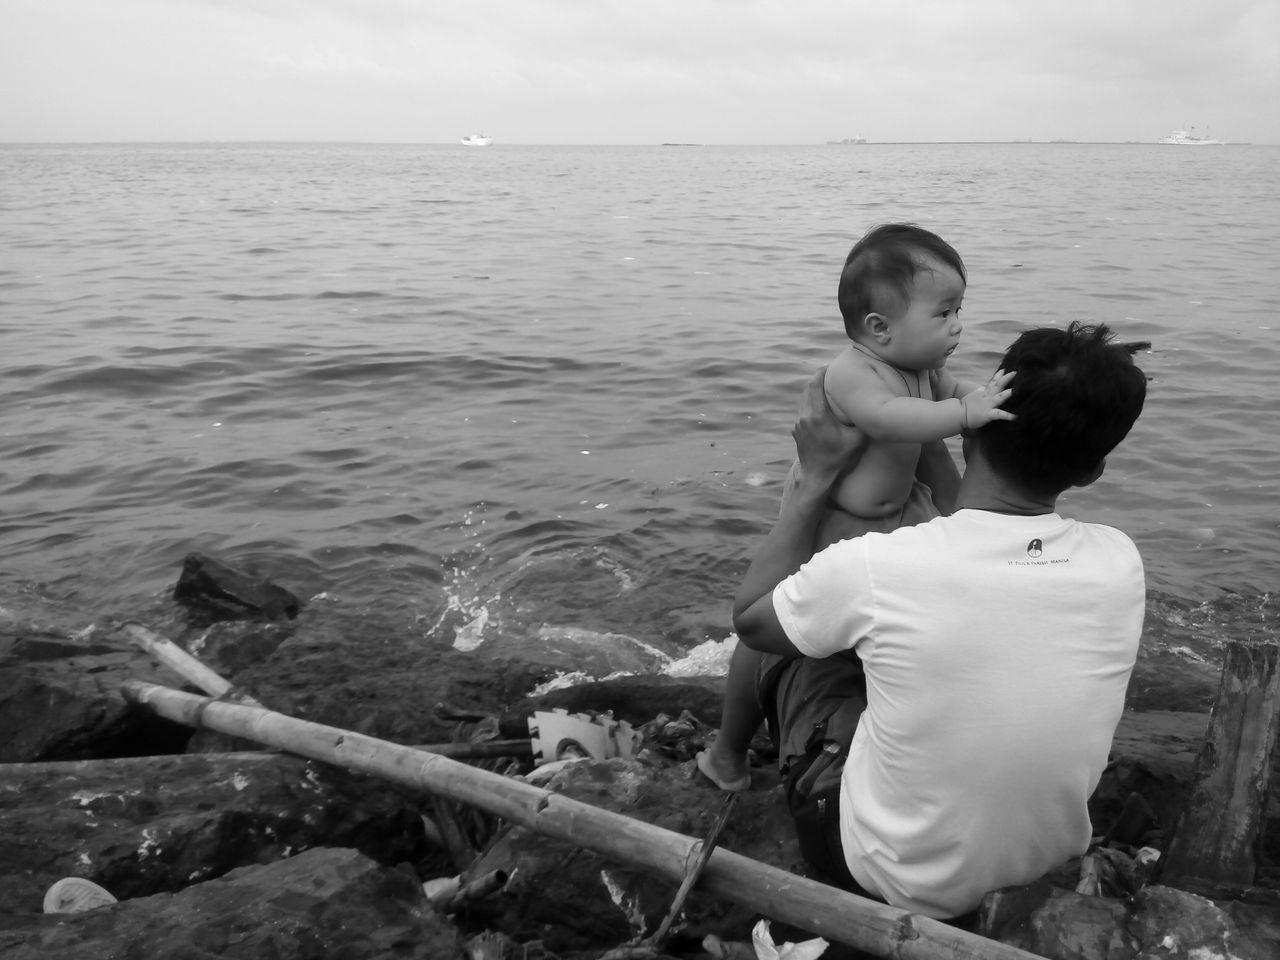 Father & Son Fatherhood Moments Monochrome Black & White Street Photography Horizon Over Water Innocence Eyeem Philippines Bonding Time Monochrome Photography Enjoy The New Normal